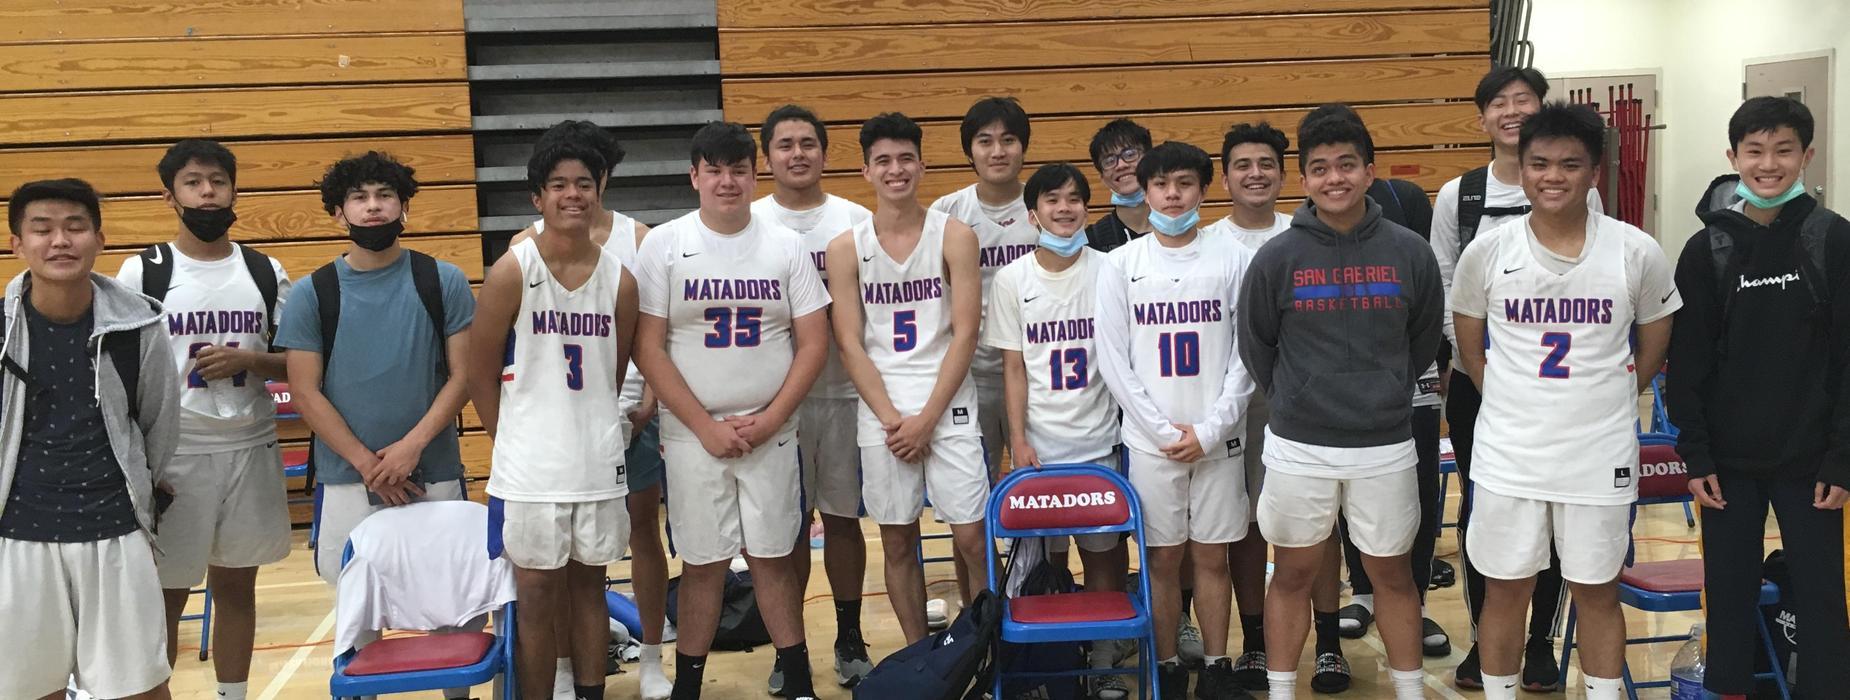 SGHS Matadors Basketball Team